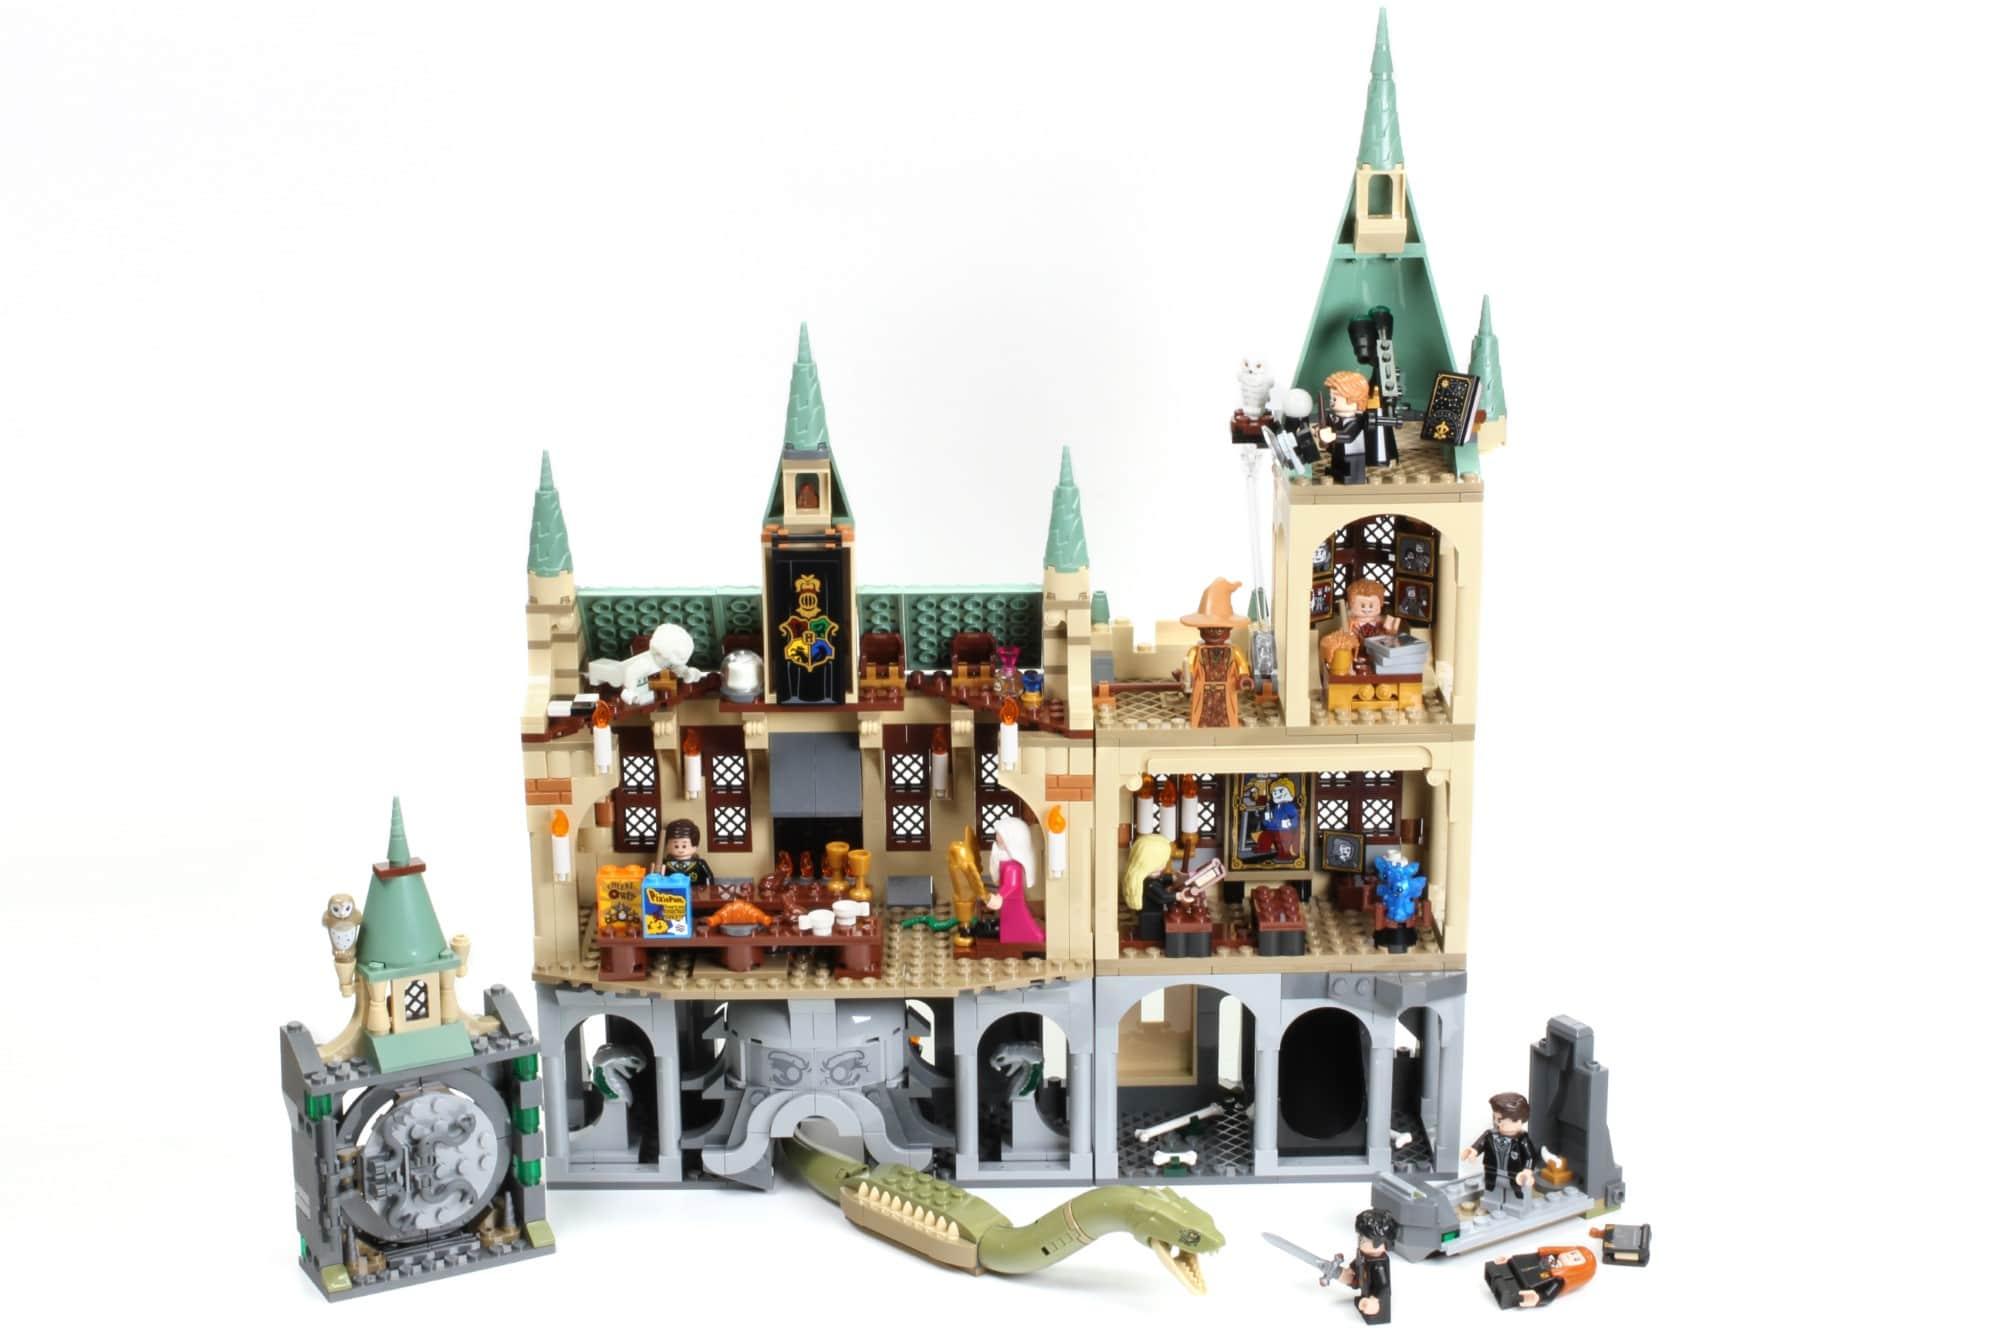 LEGO Harry Potter 76389 Hogwarts Kammer Des Schreckens Schritt 9 13